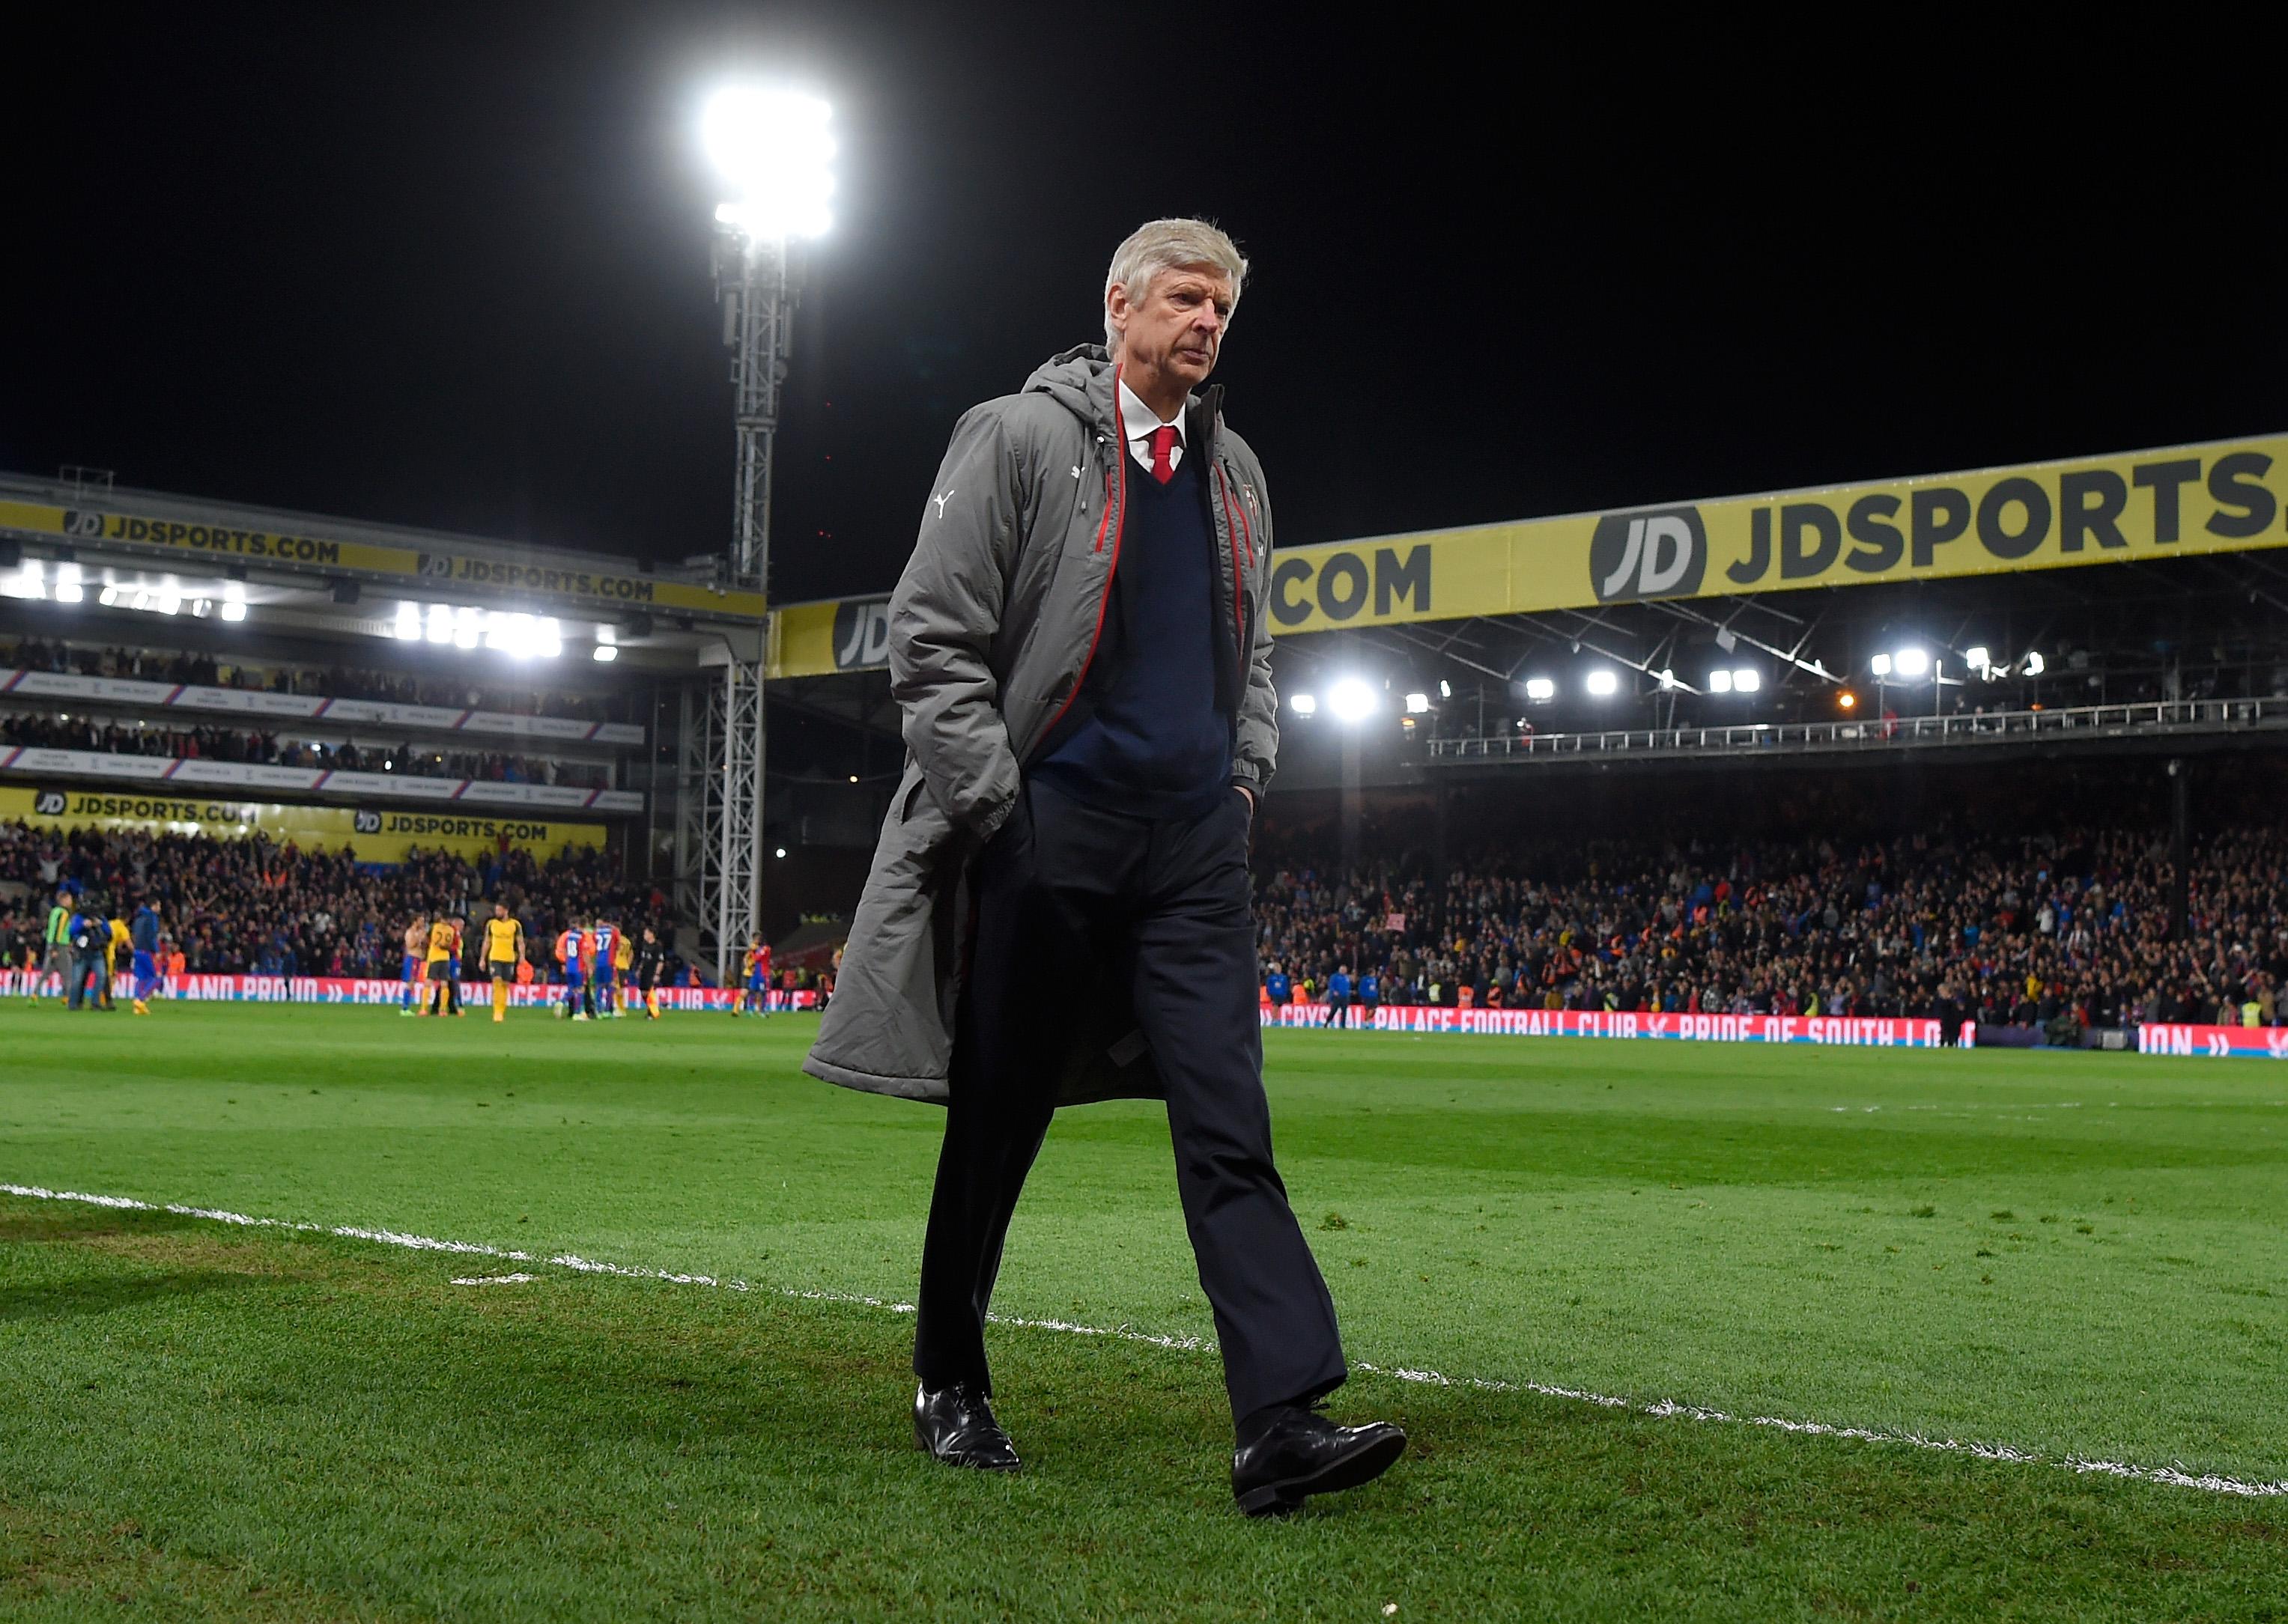 Arsenal's Lucas Perez keen on transfer back to Deportivo La Coruna